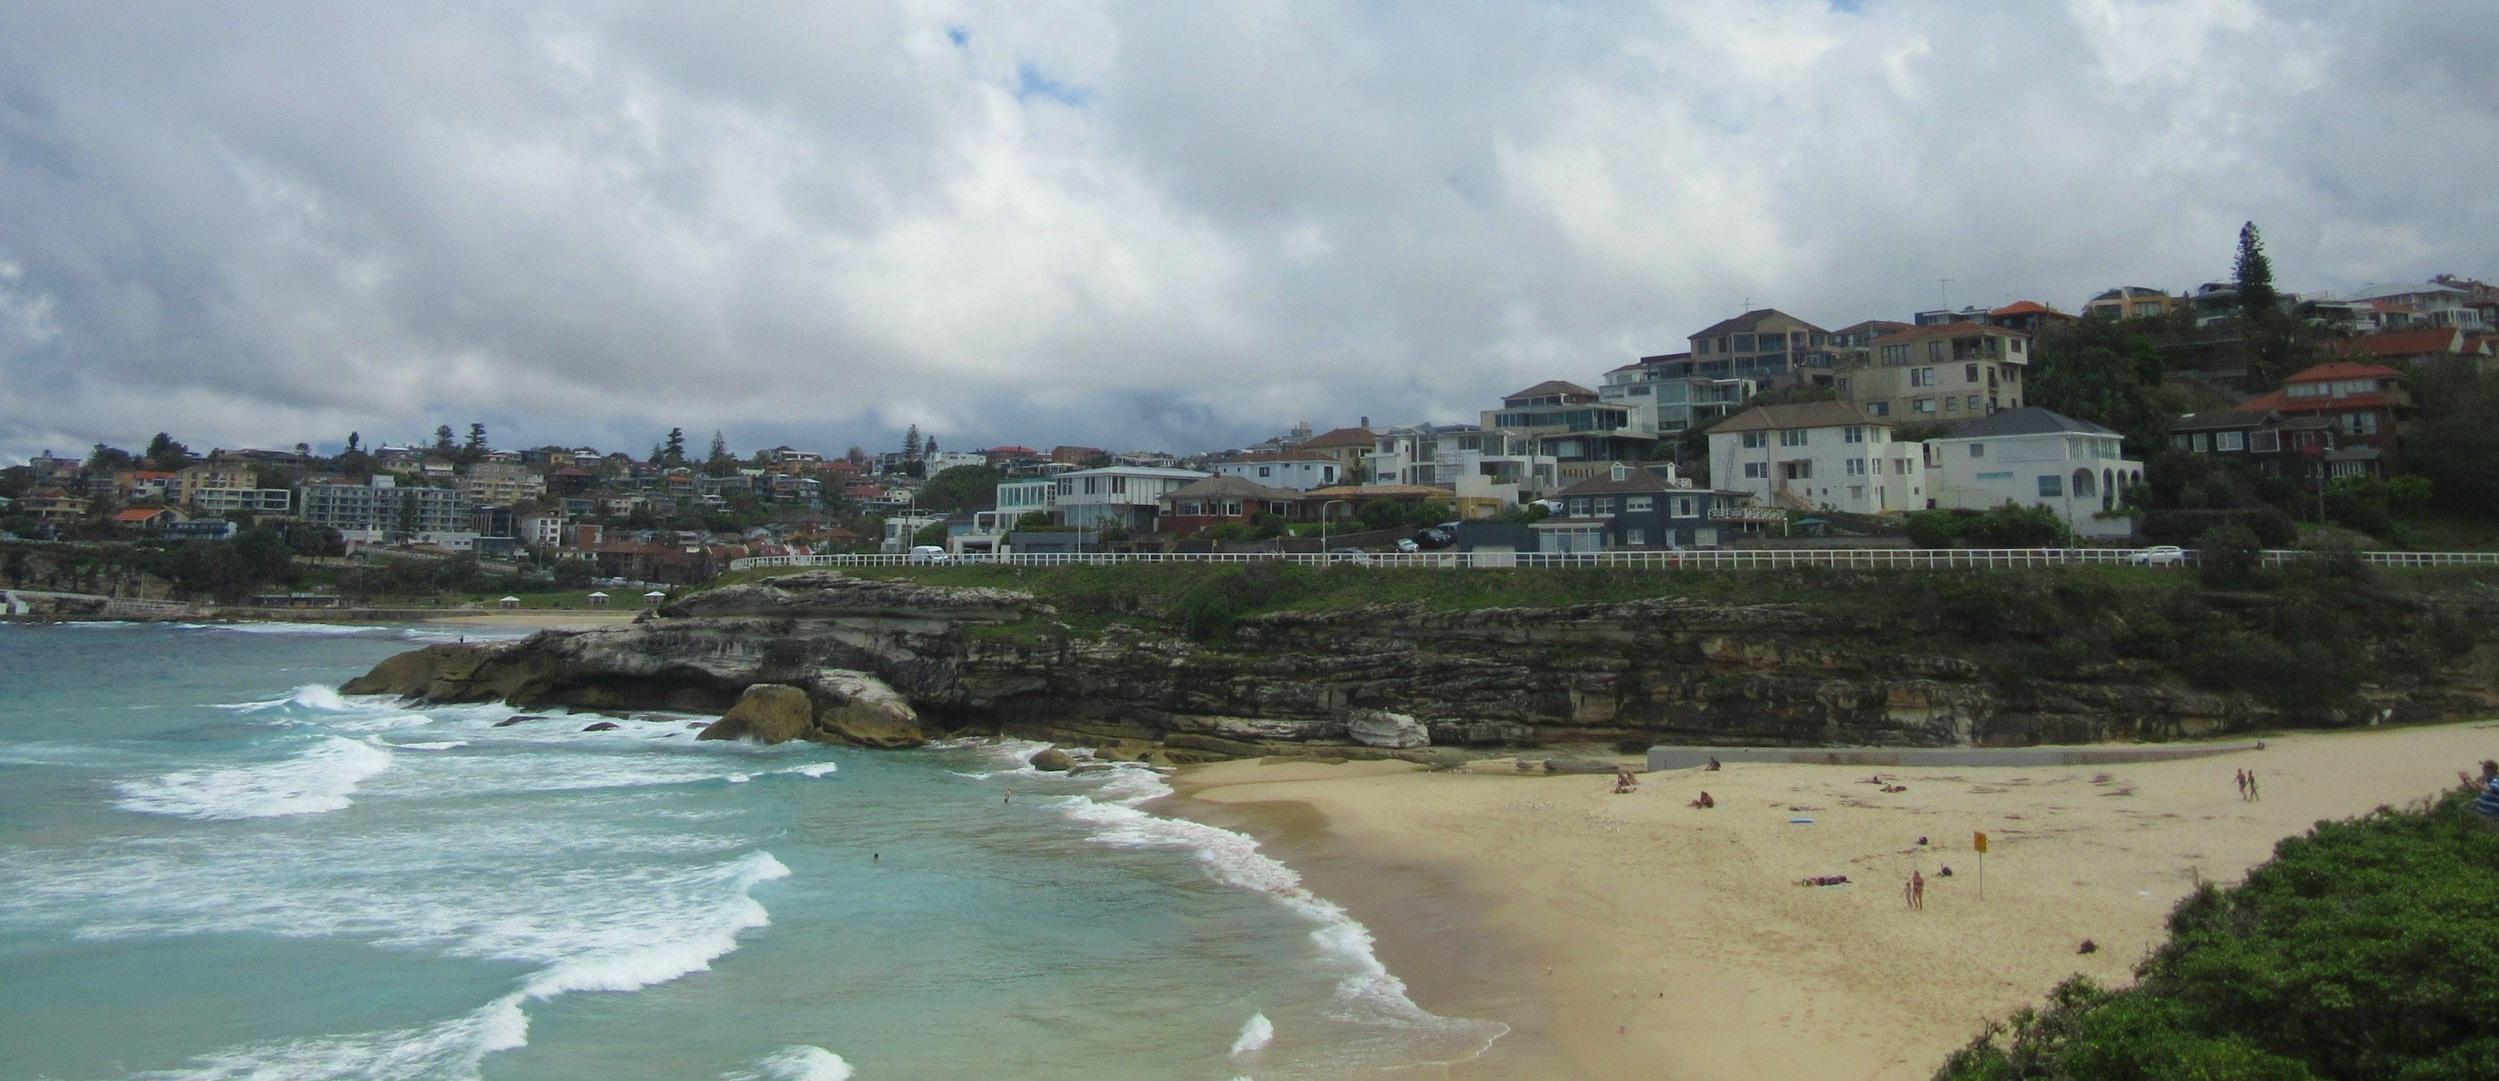 South+Island+Art+Sydney+Bondi+to+Coogee.jpg